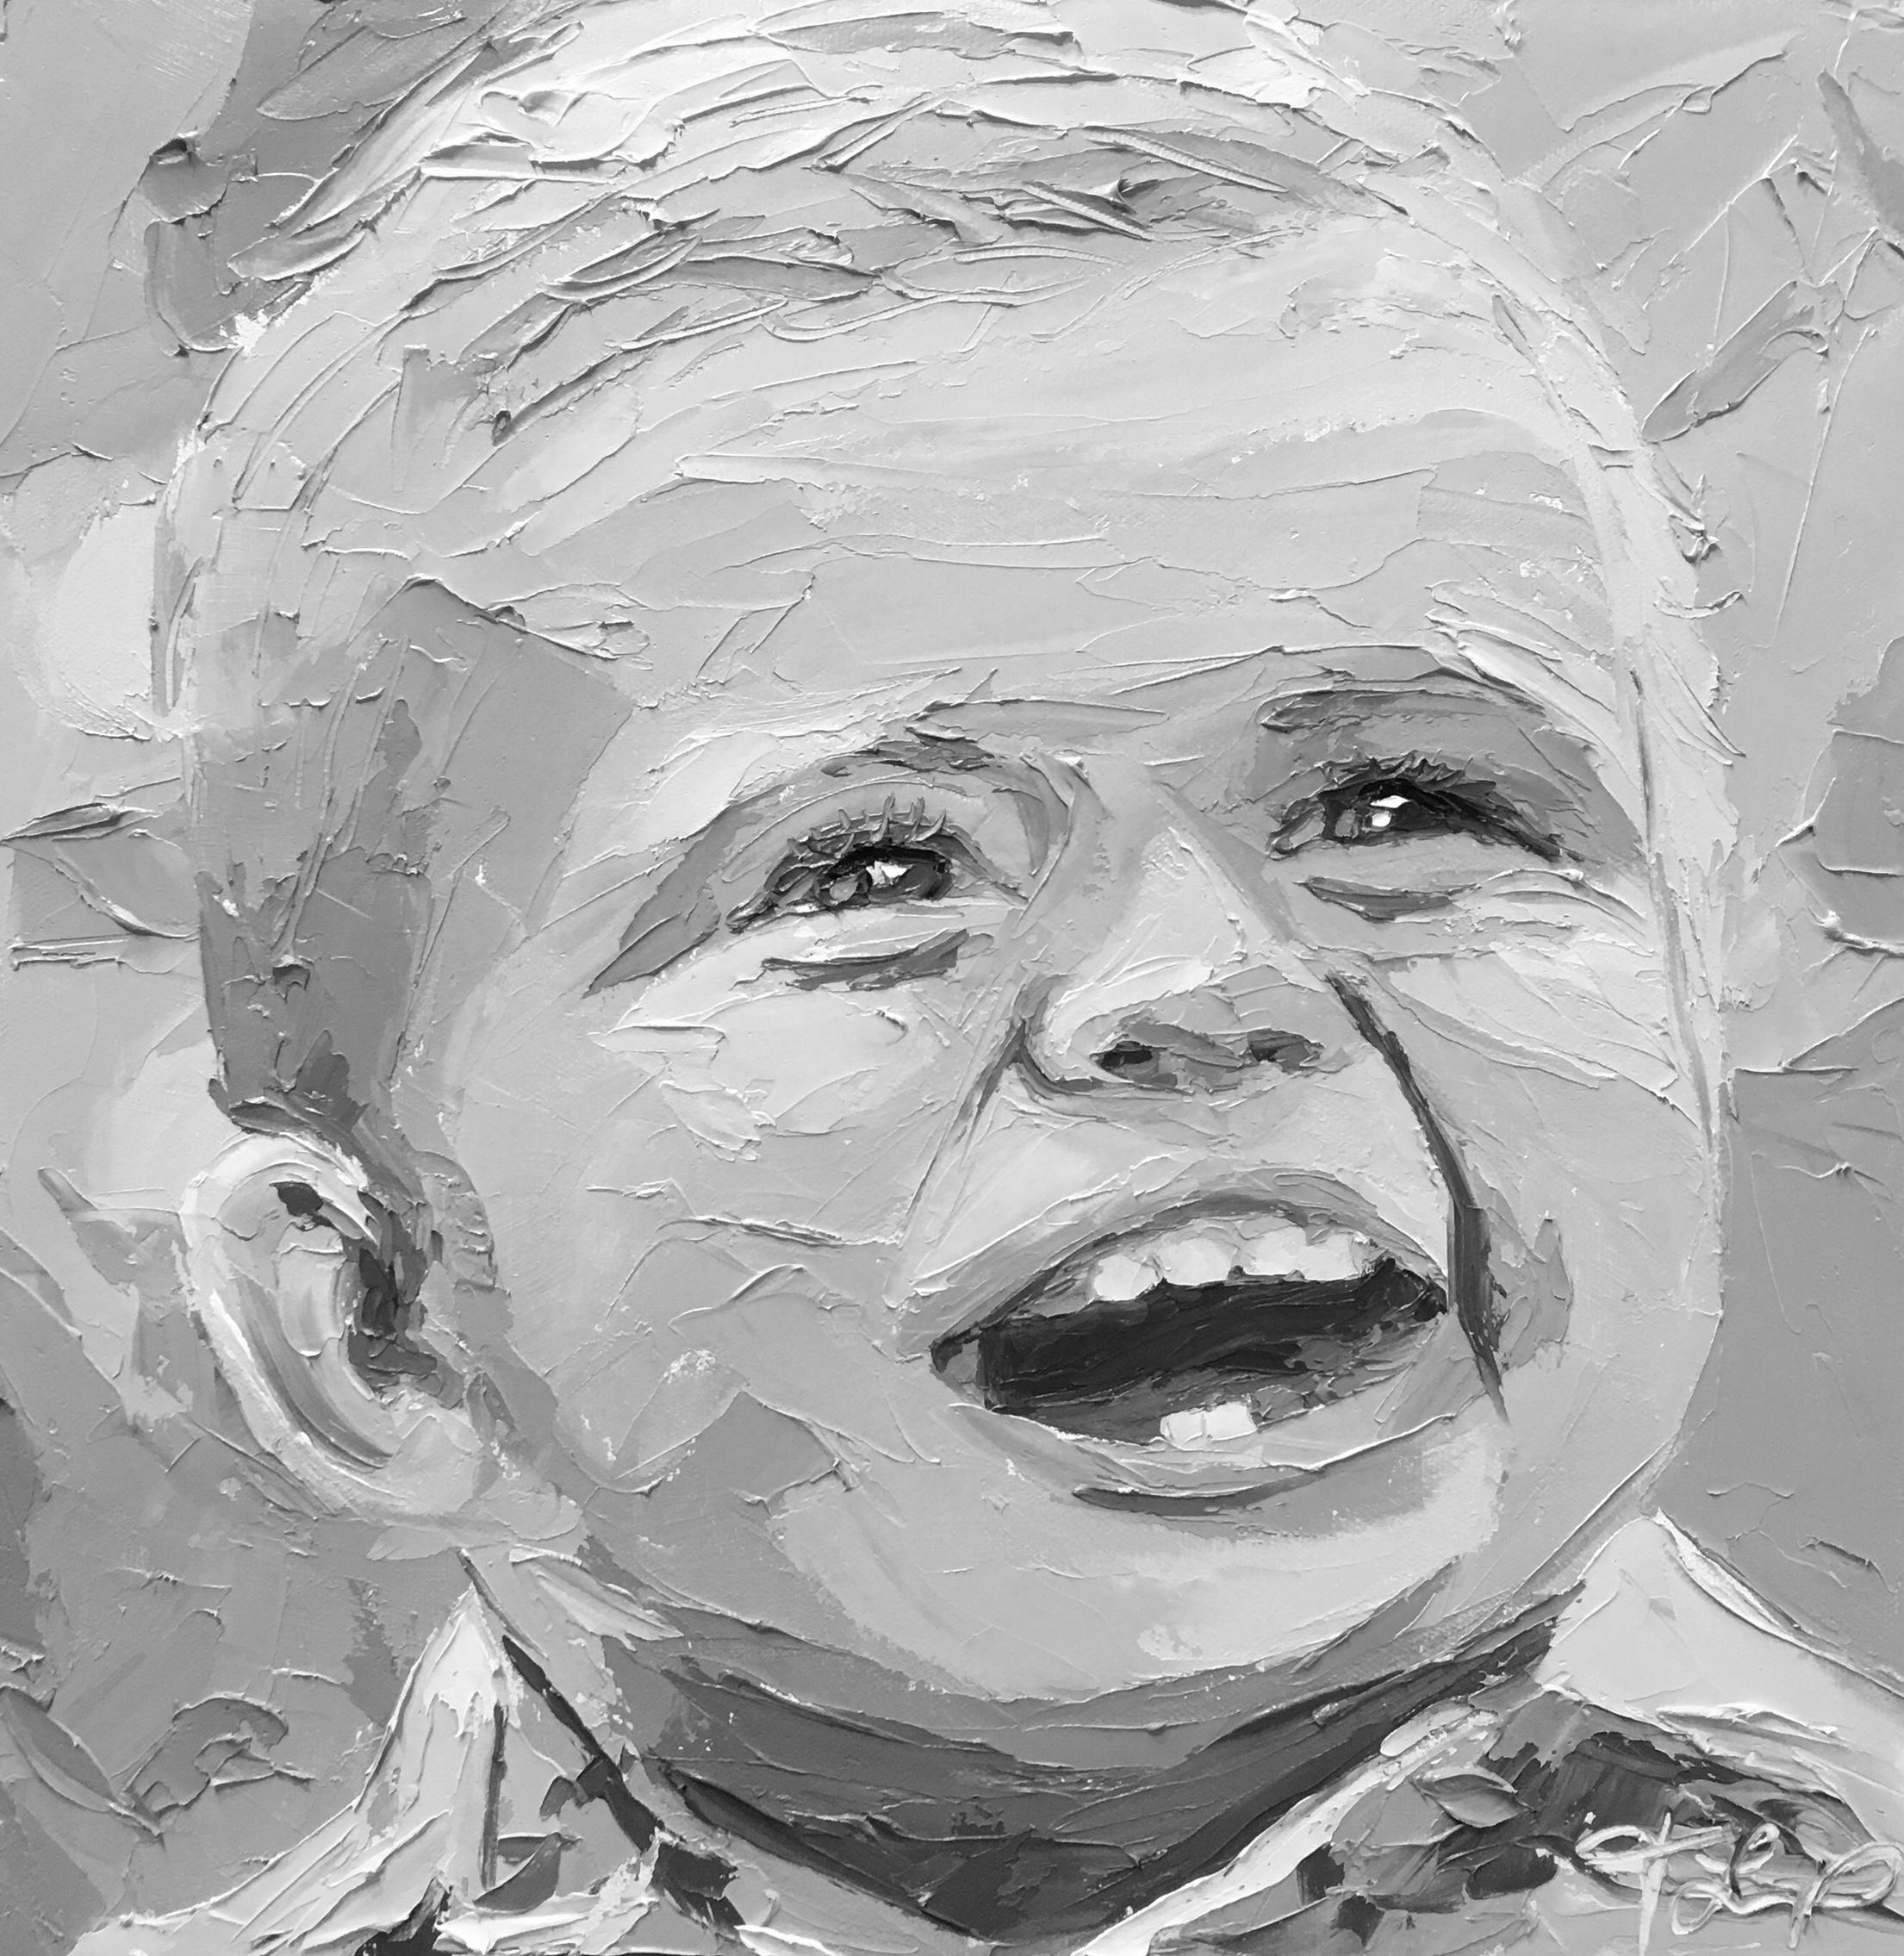 Black & White Palette Knife Painting Portraits